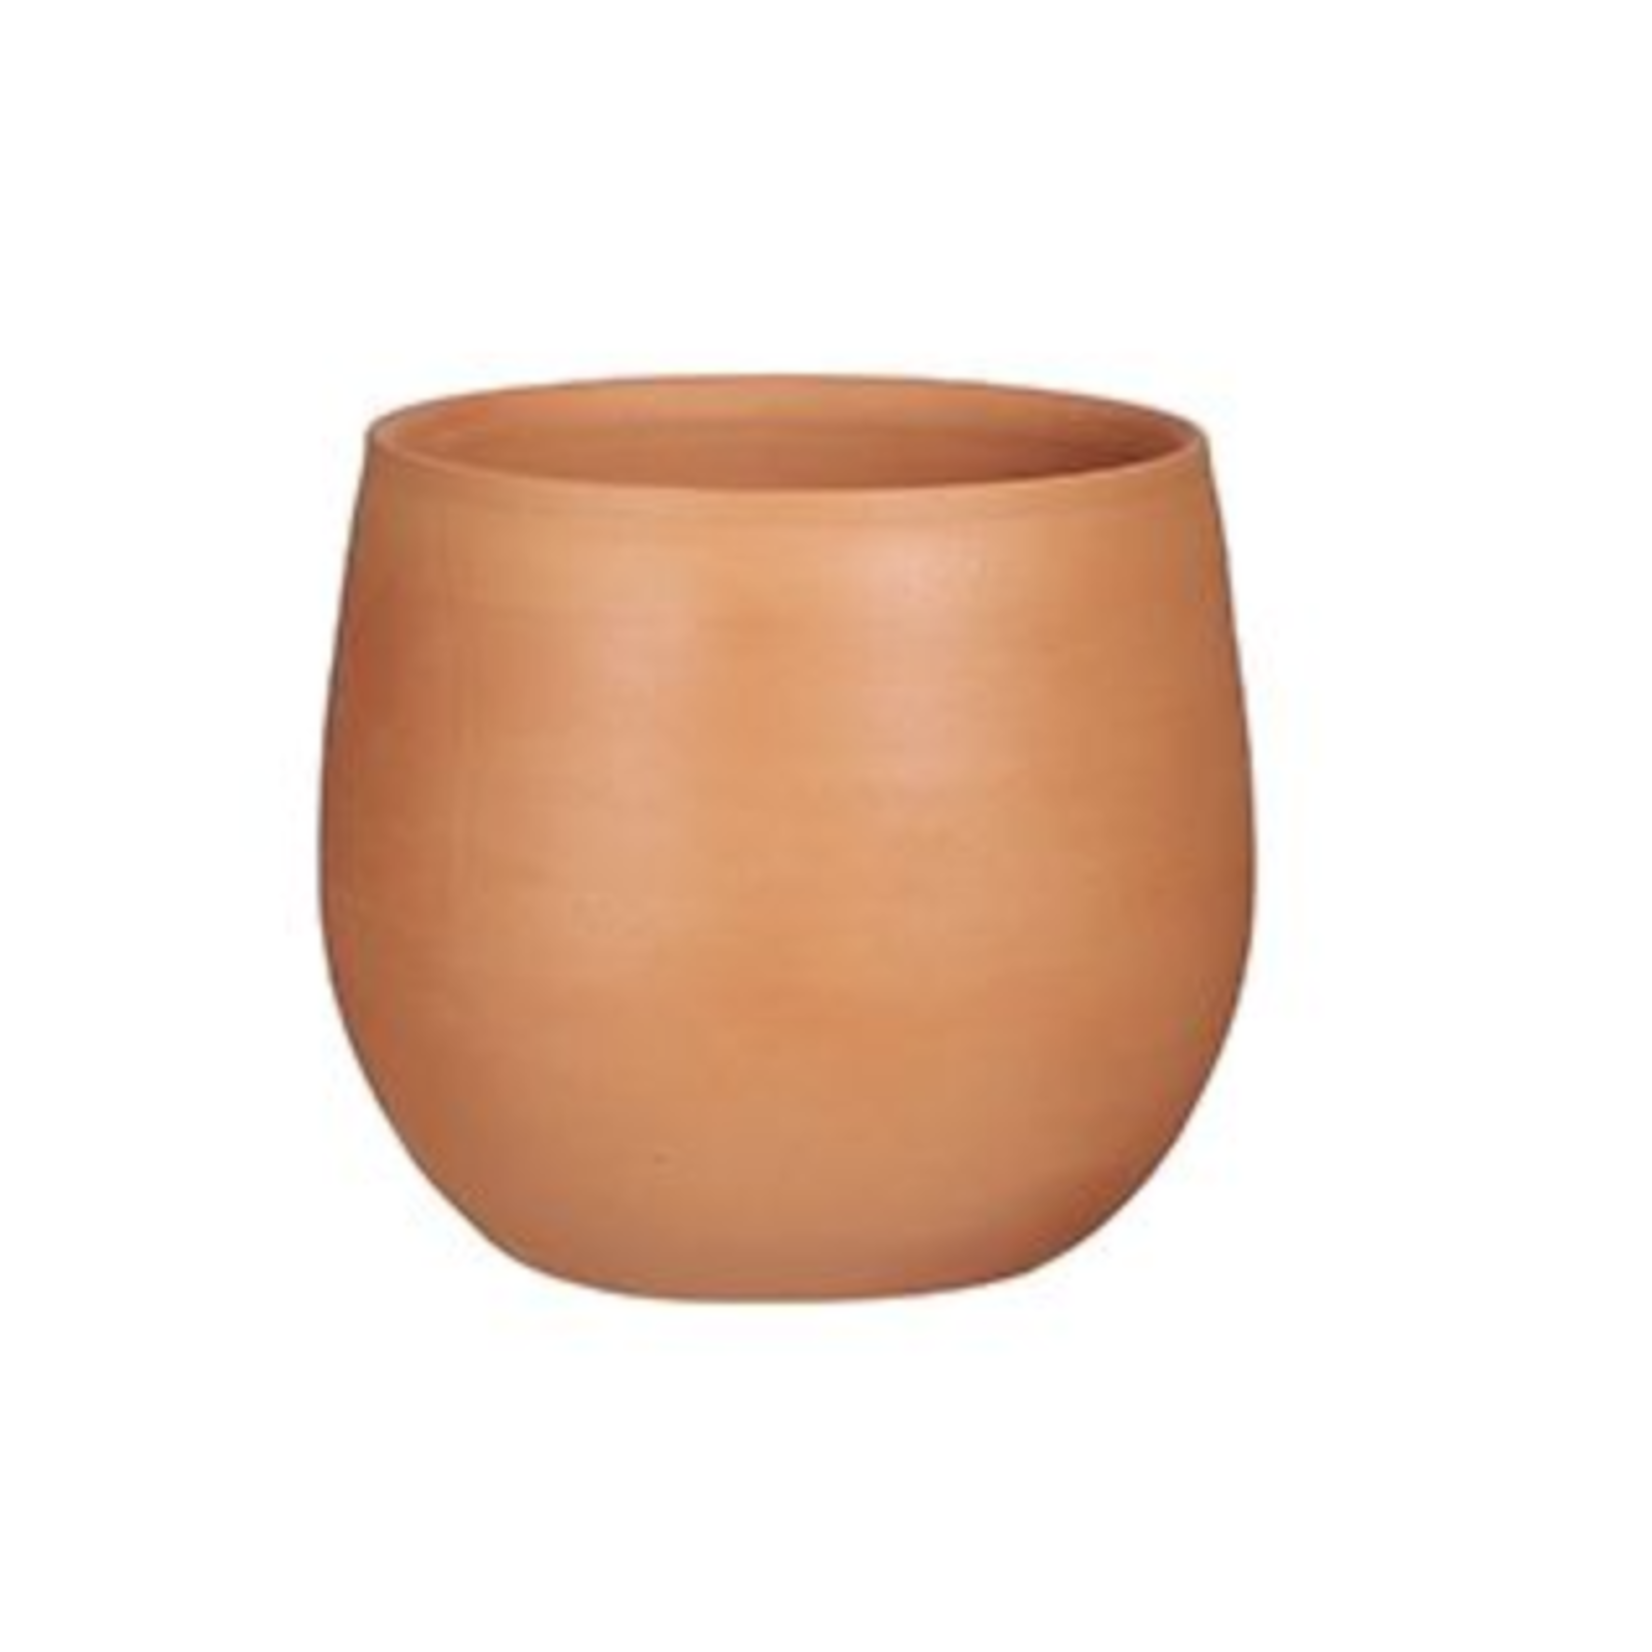 Edelman Oliver terracotta ∅ 16